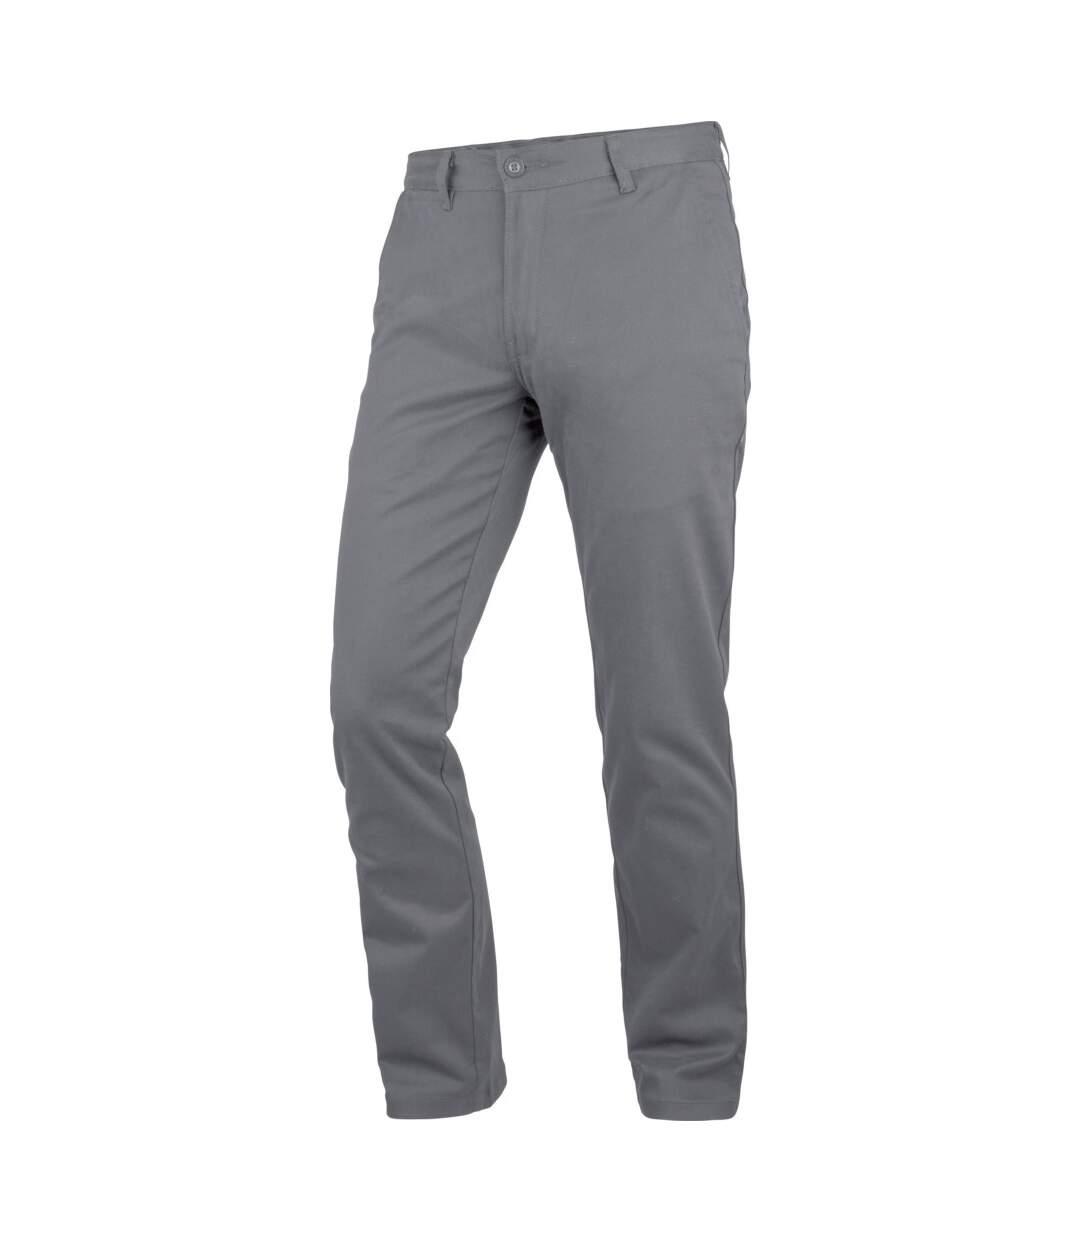 Pantalon professionnel Chino Würth MODYF gris